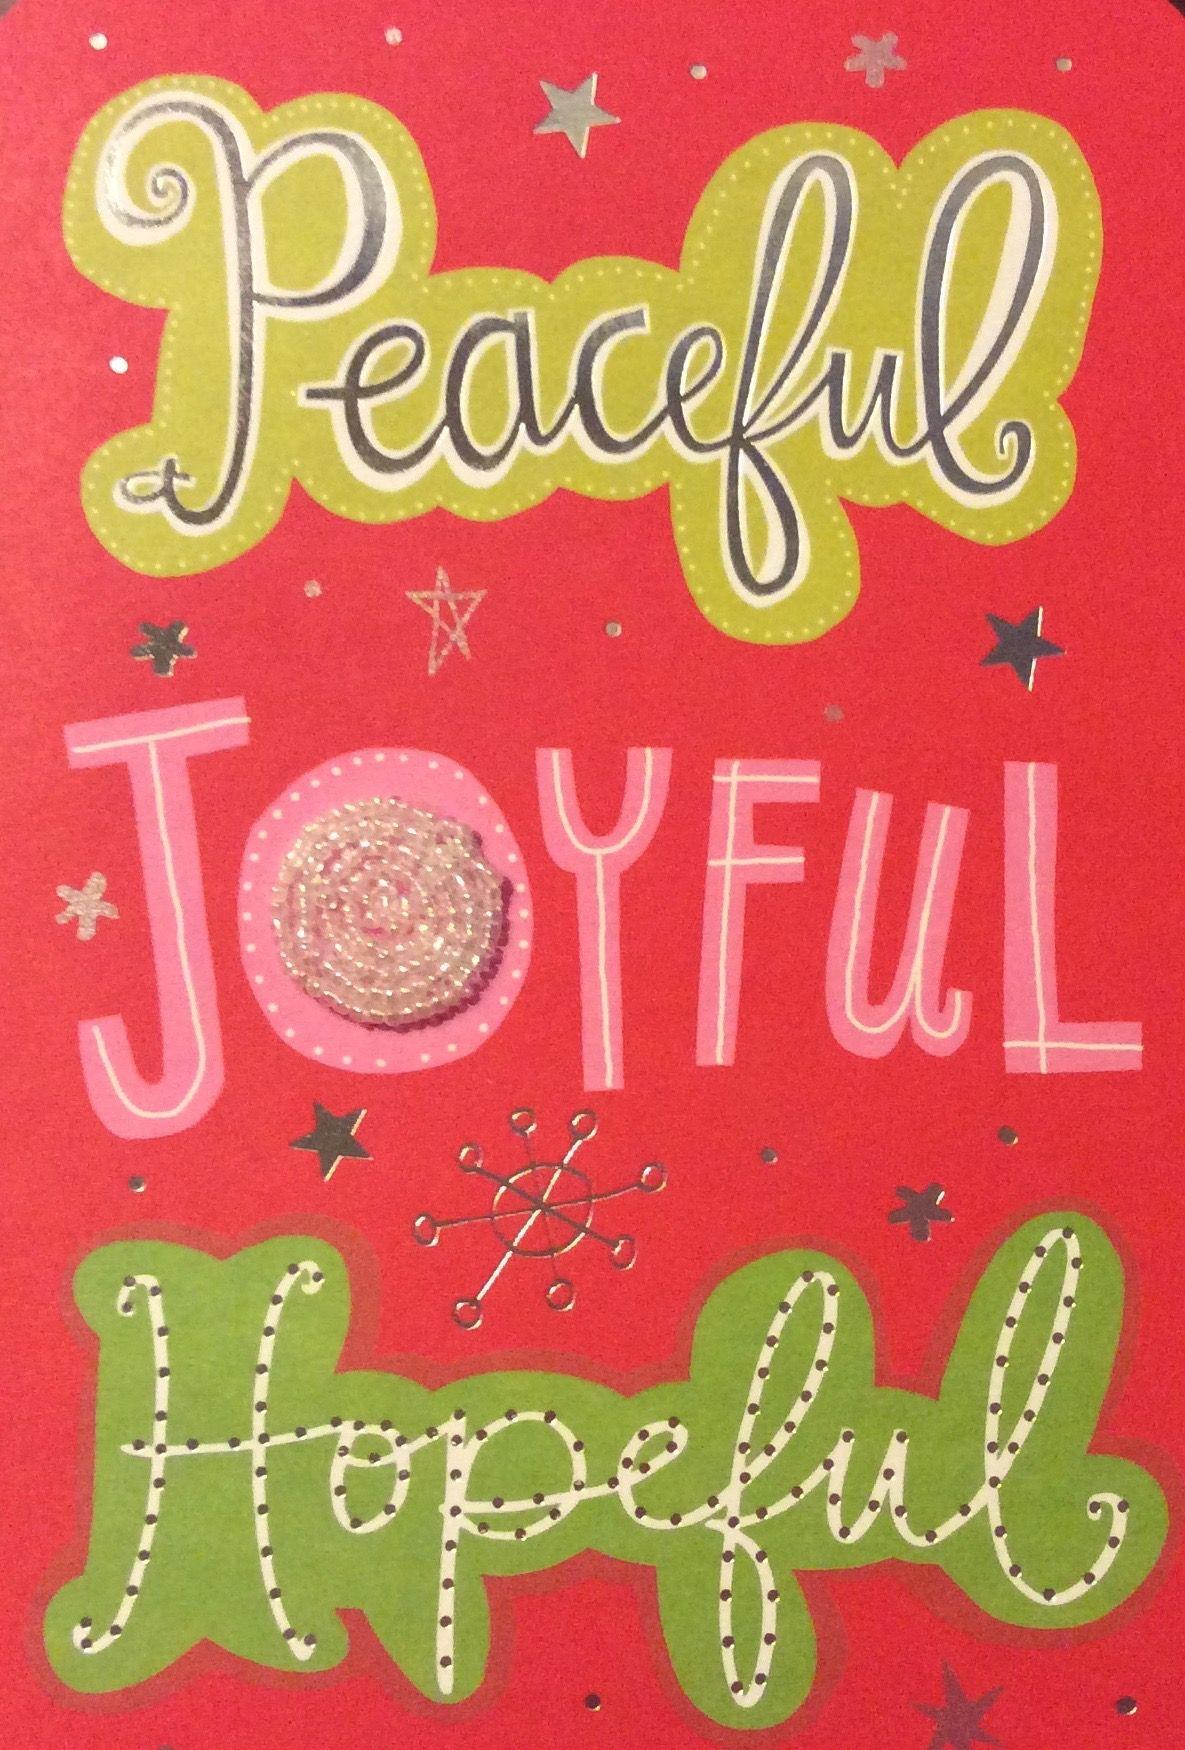 Christmas Cards Greetings Peaceful Joyful Hopeful Words